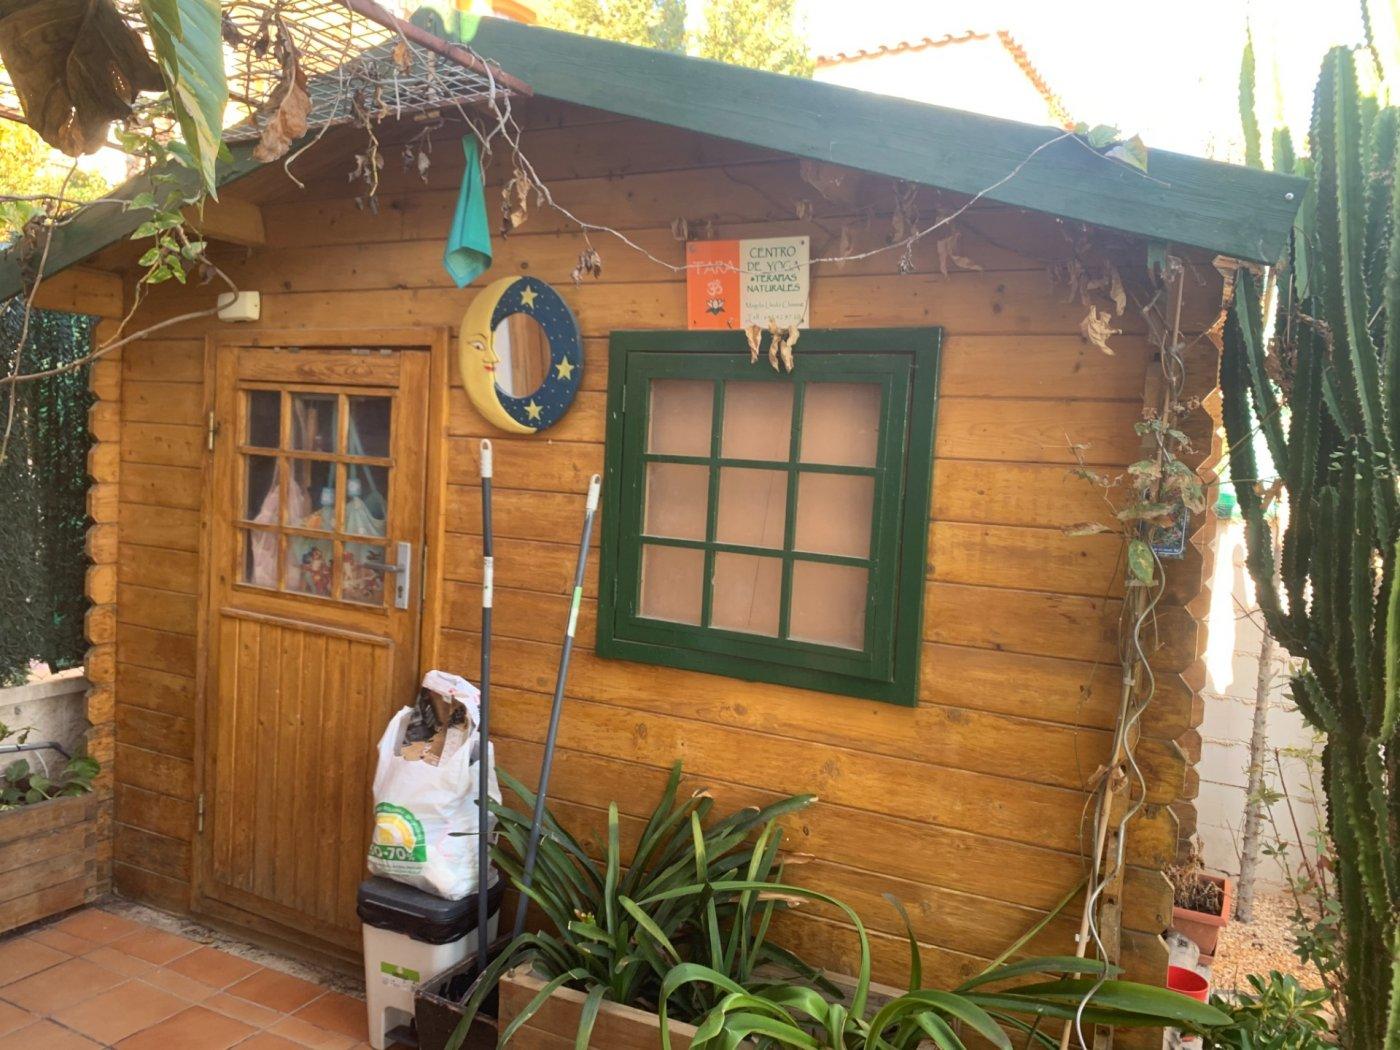 Planta baja adosada con jardin en bonalva - imagenInmueble19